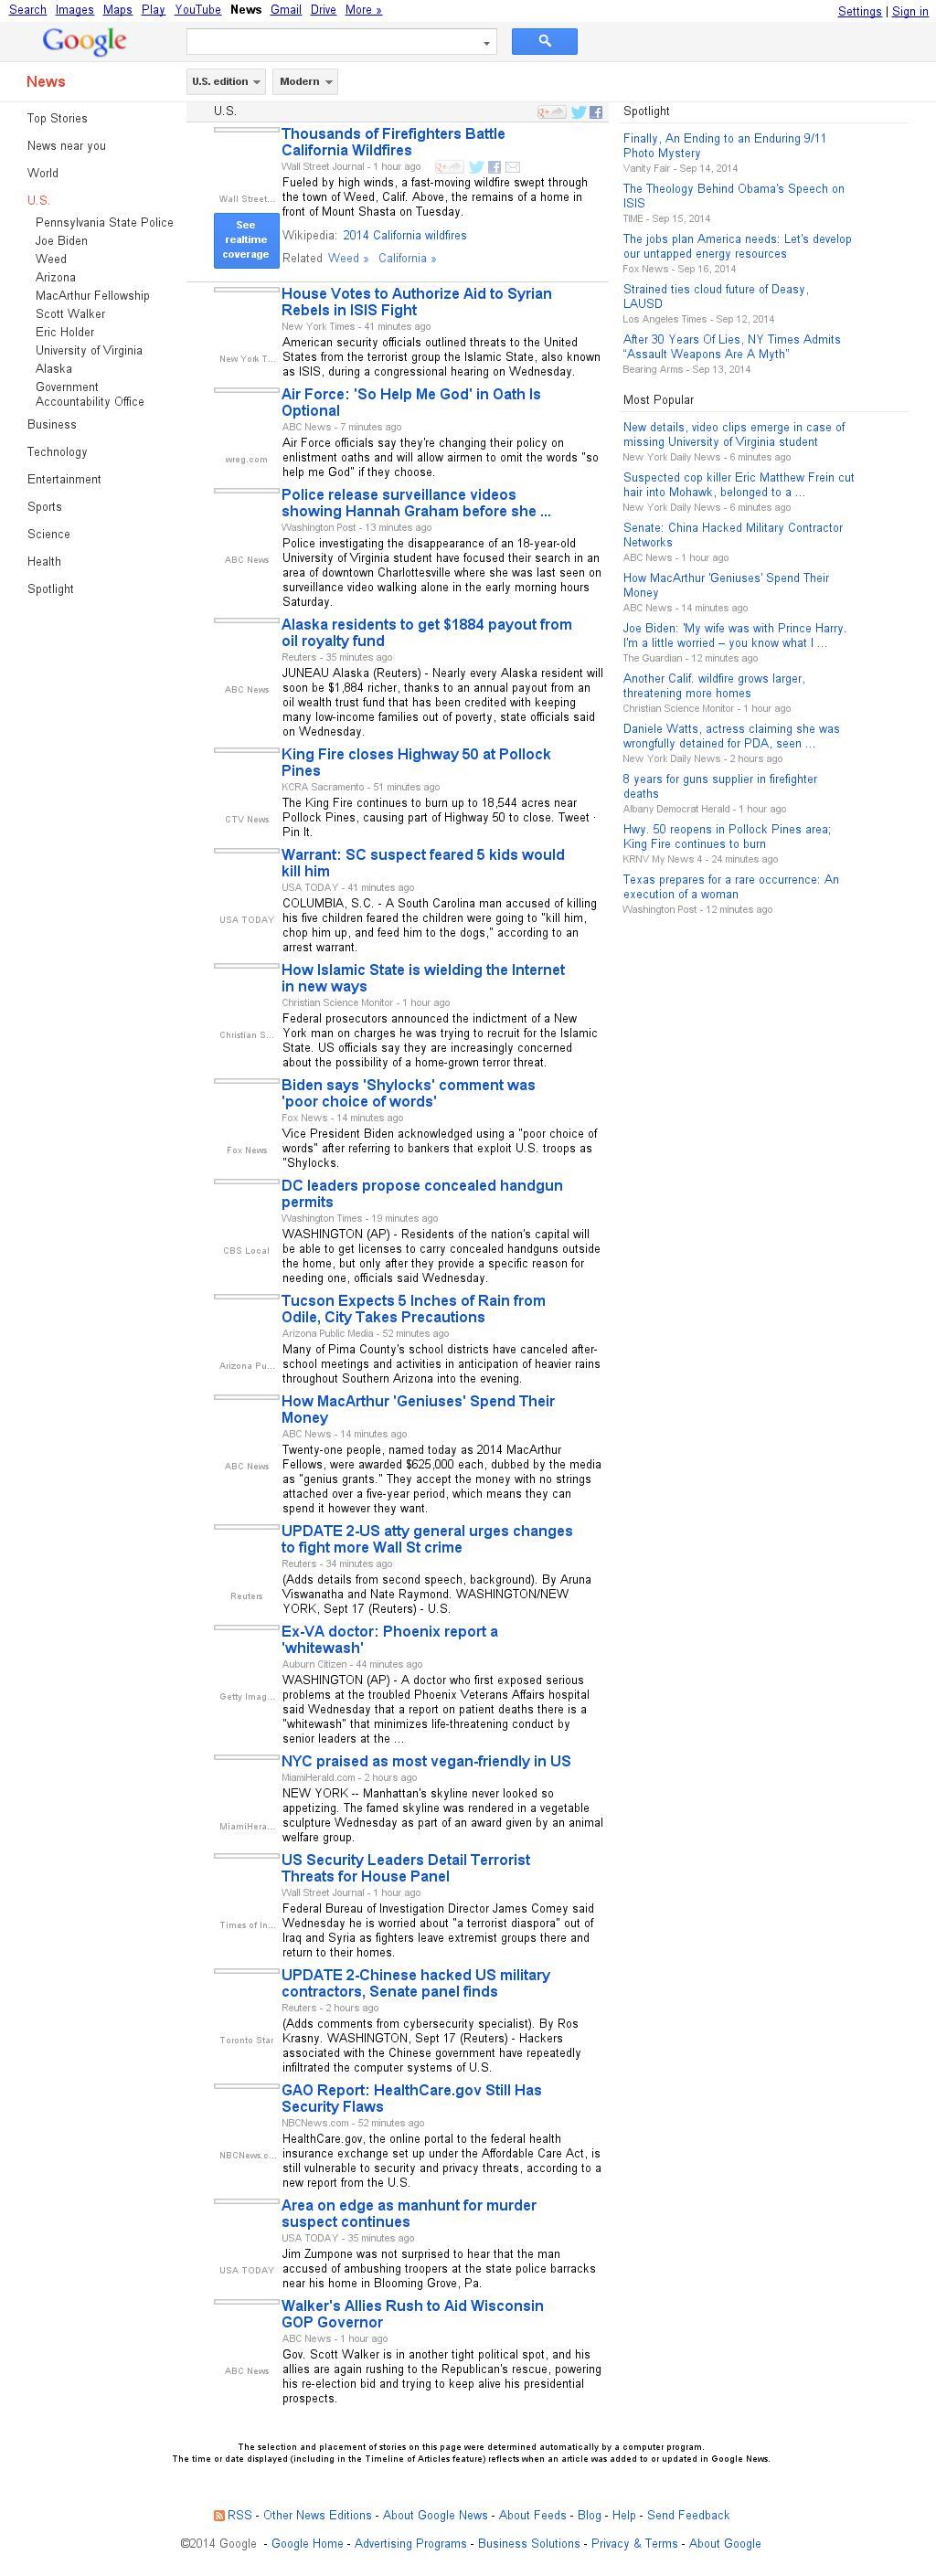 Google News: U.S. at Wednesday Sept. 17, 2014, 10:08 p.m. UTC